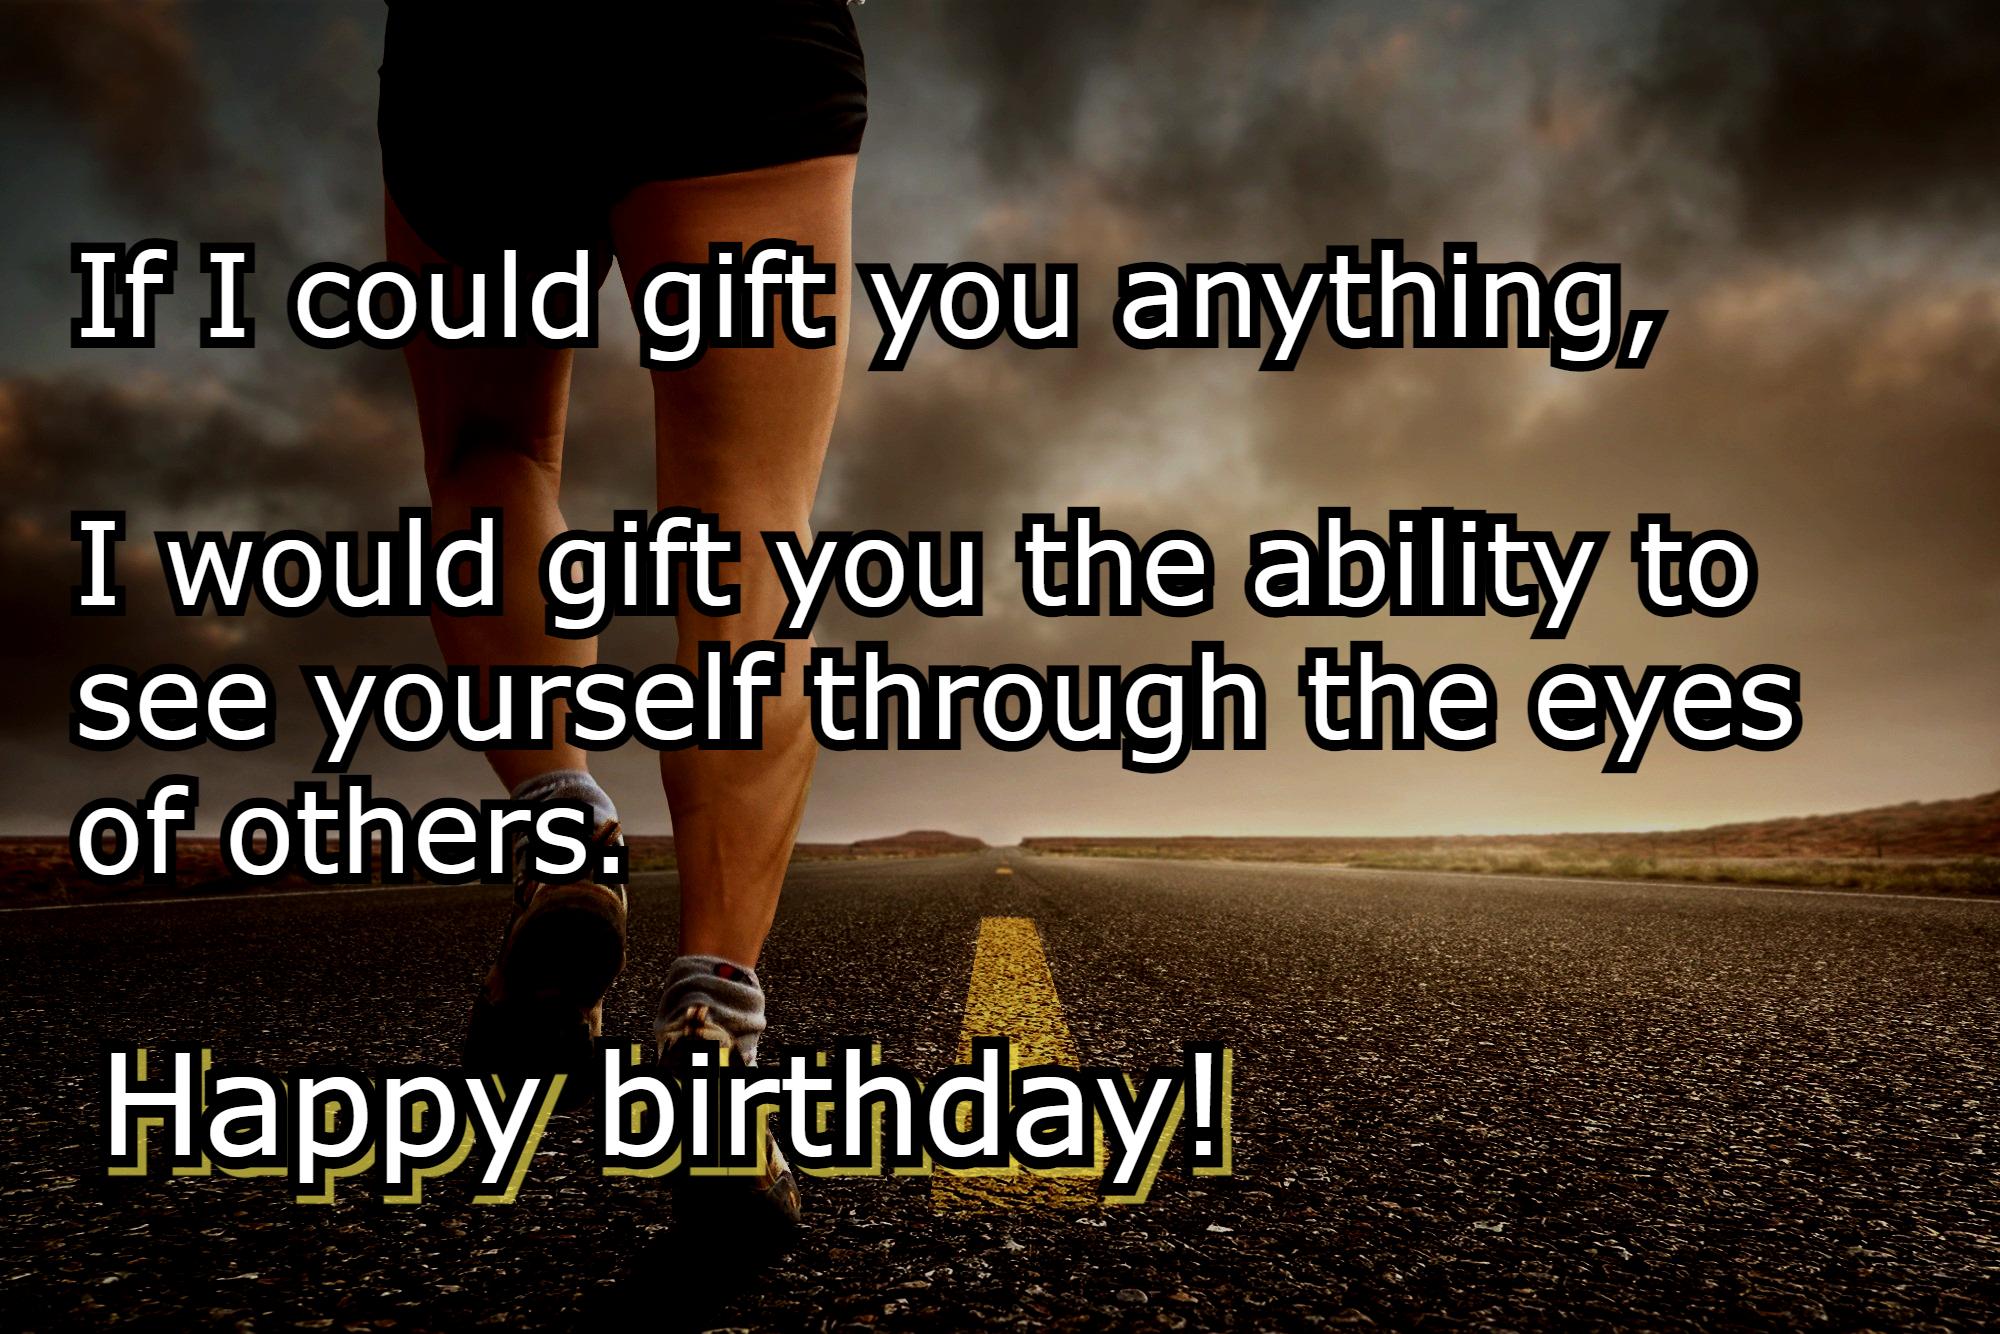 Motivational and Inspirational Birthday Status